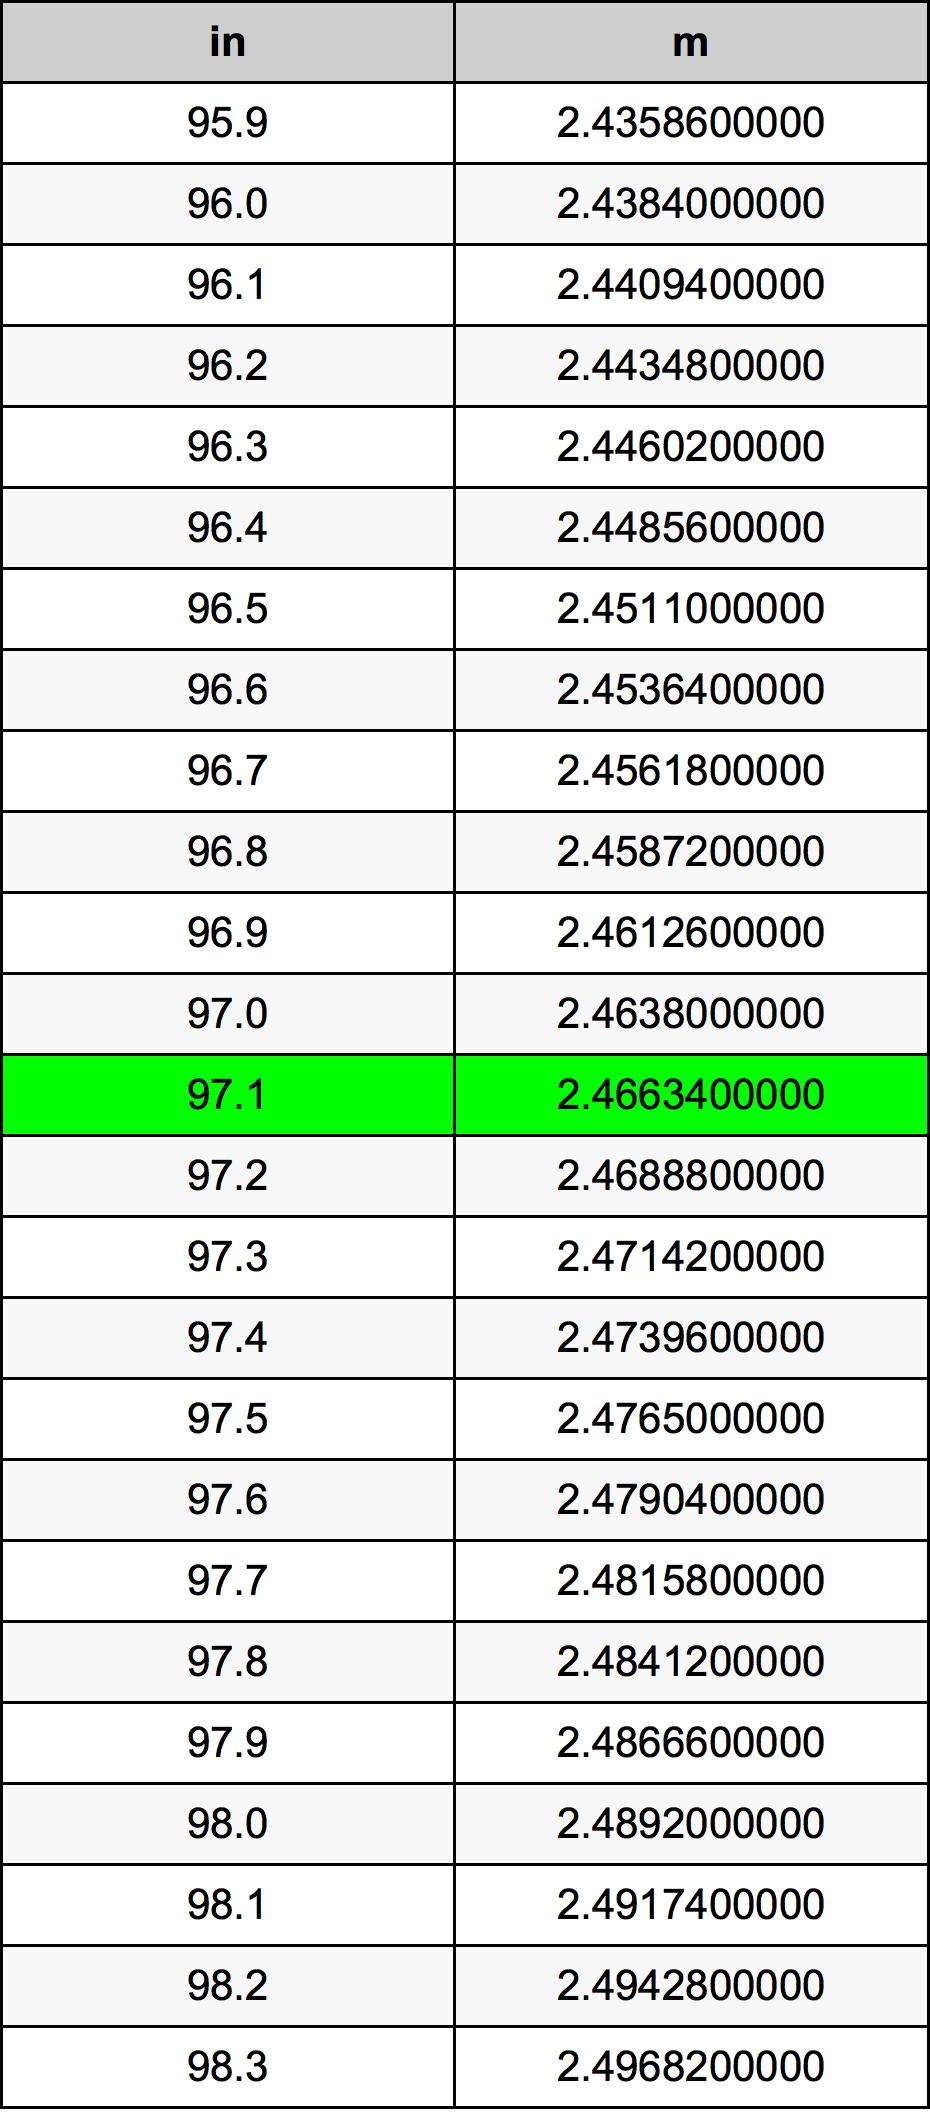 97.1 इंच रूपांतरण सारणी